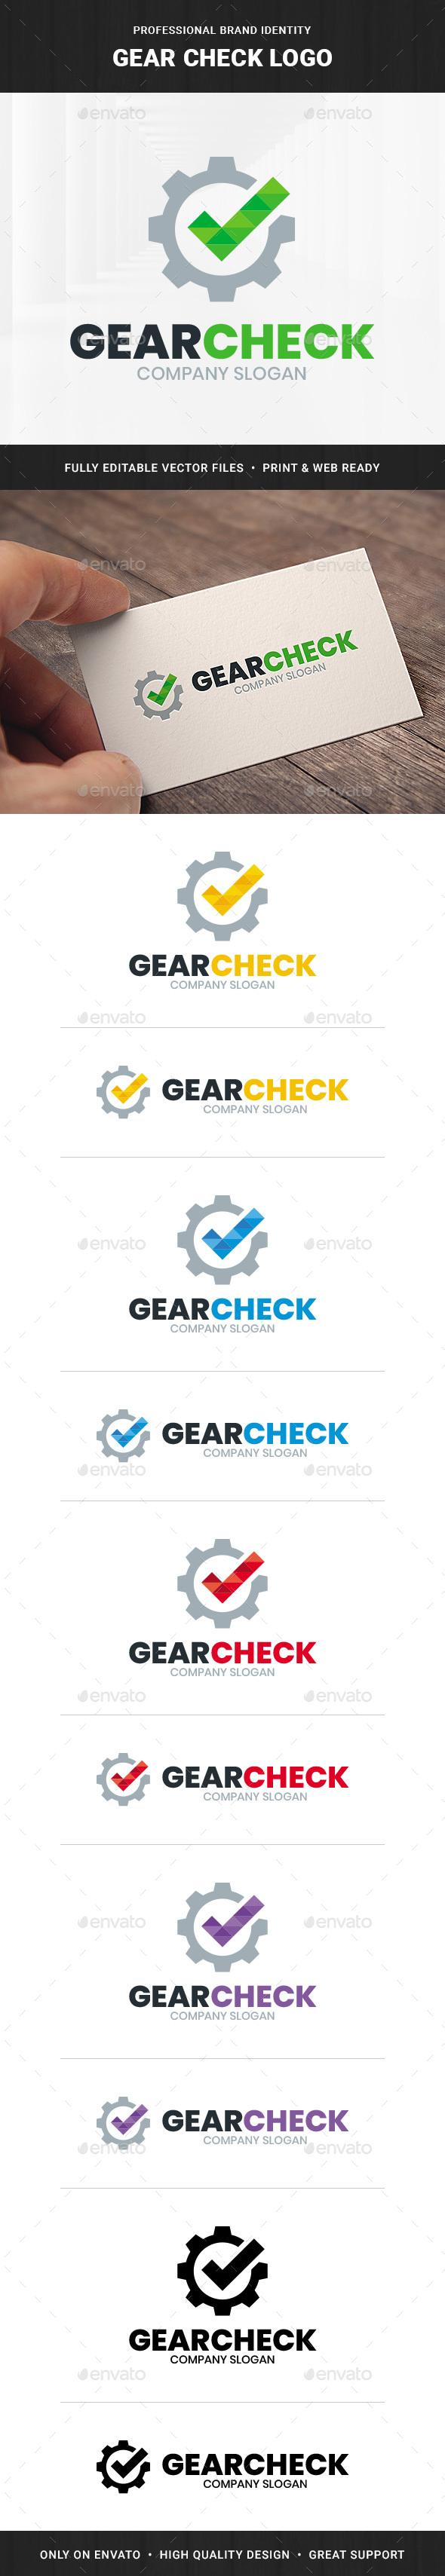 Gear Check Logo Temlate